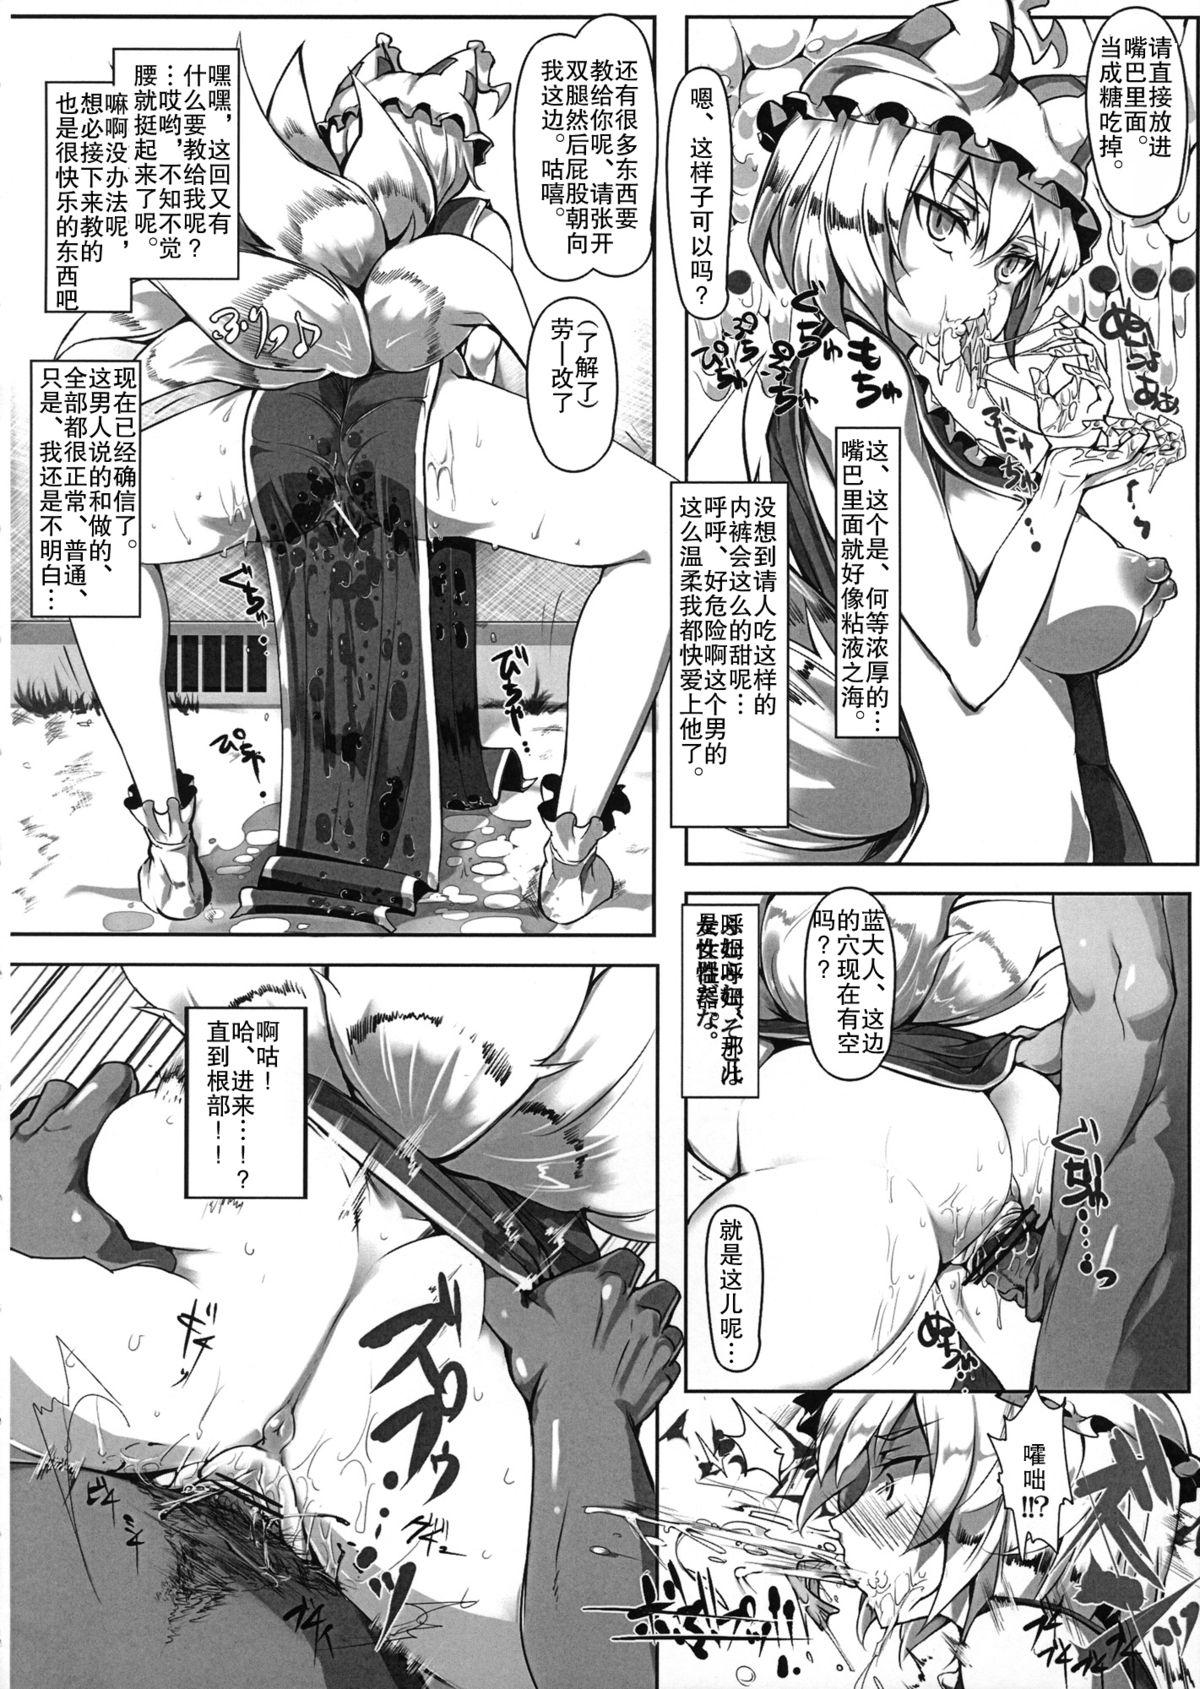 (Reitaisai 10) [Nyuu Koubou (Nyuu)] Saimin Nante Kakaranai!!! (Touhou Project)) [Chinese] [后悔的神官个人汉化] 23